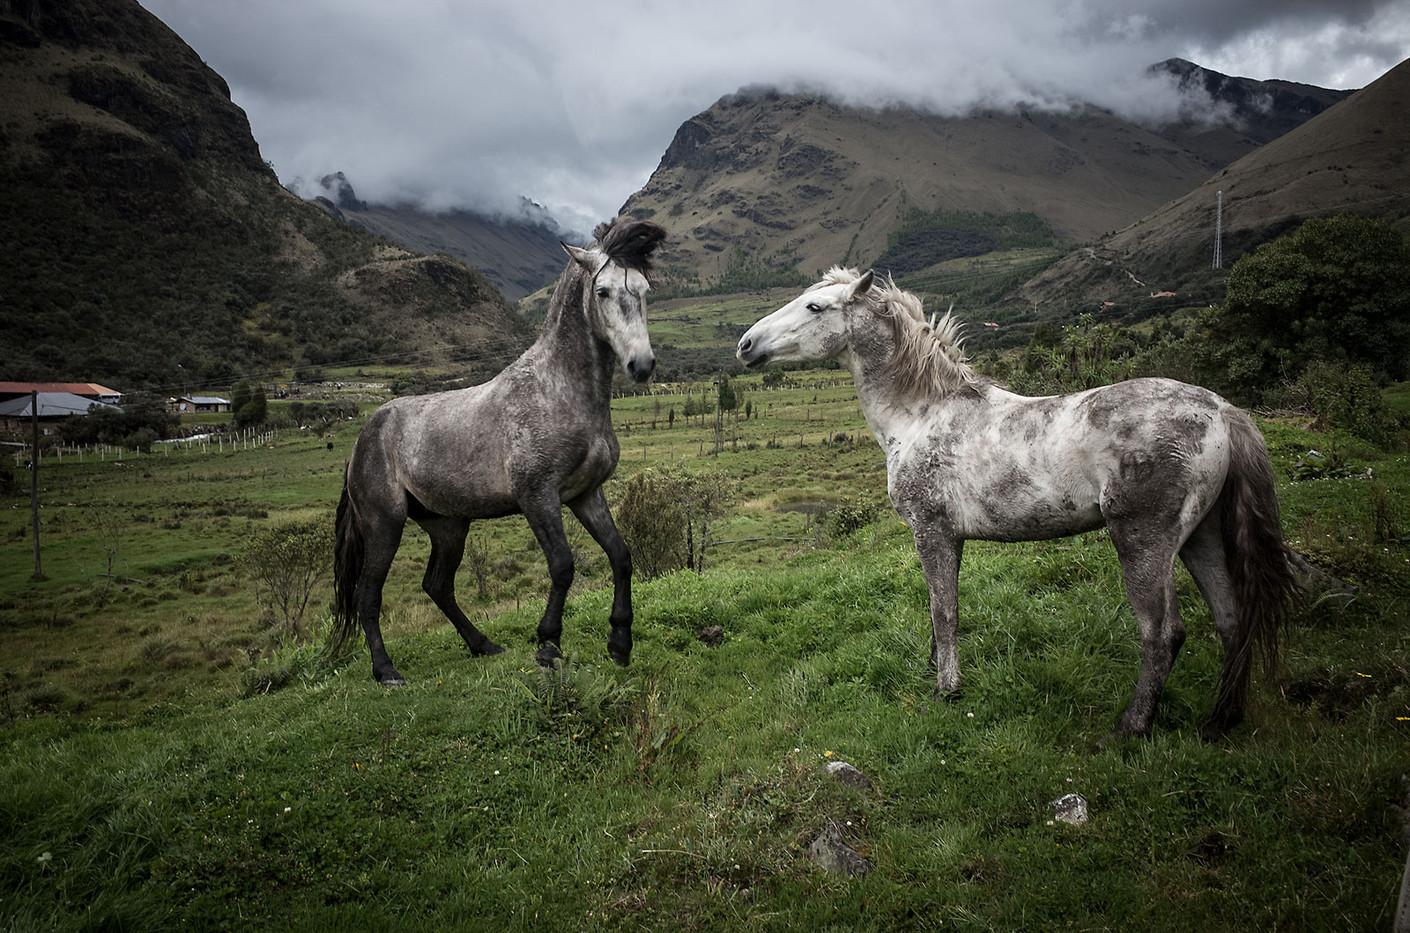 Mares on a finca in Cajas National Park near Cuenca, Ecuador.